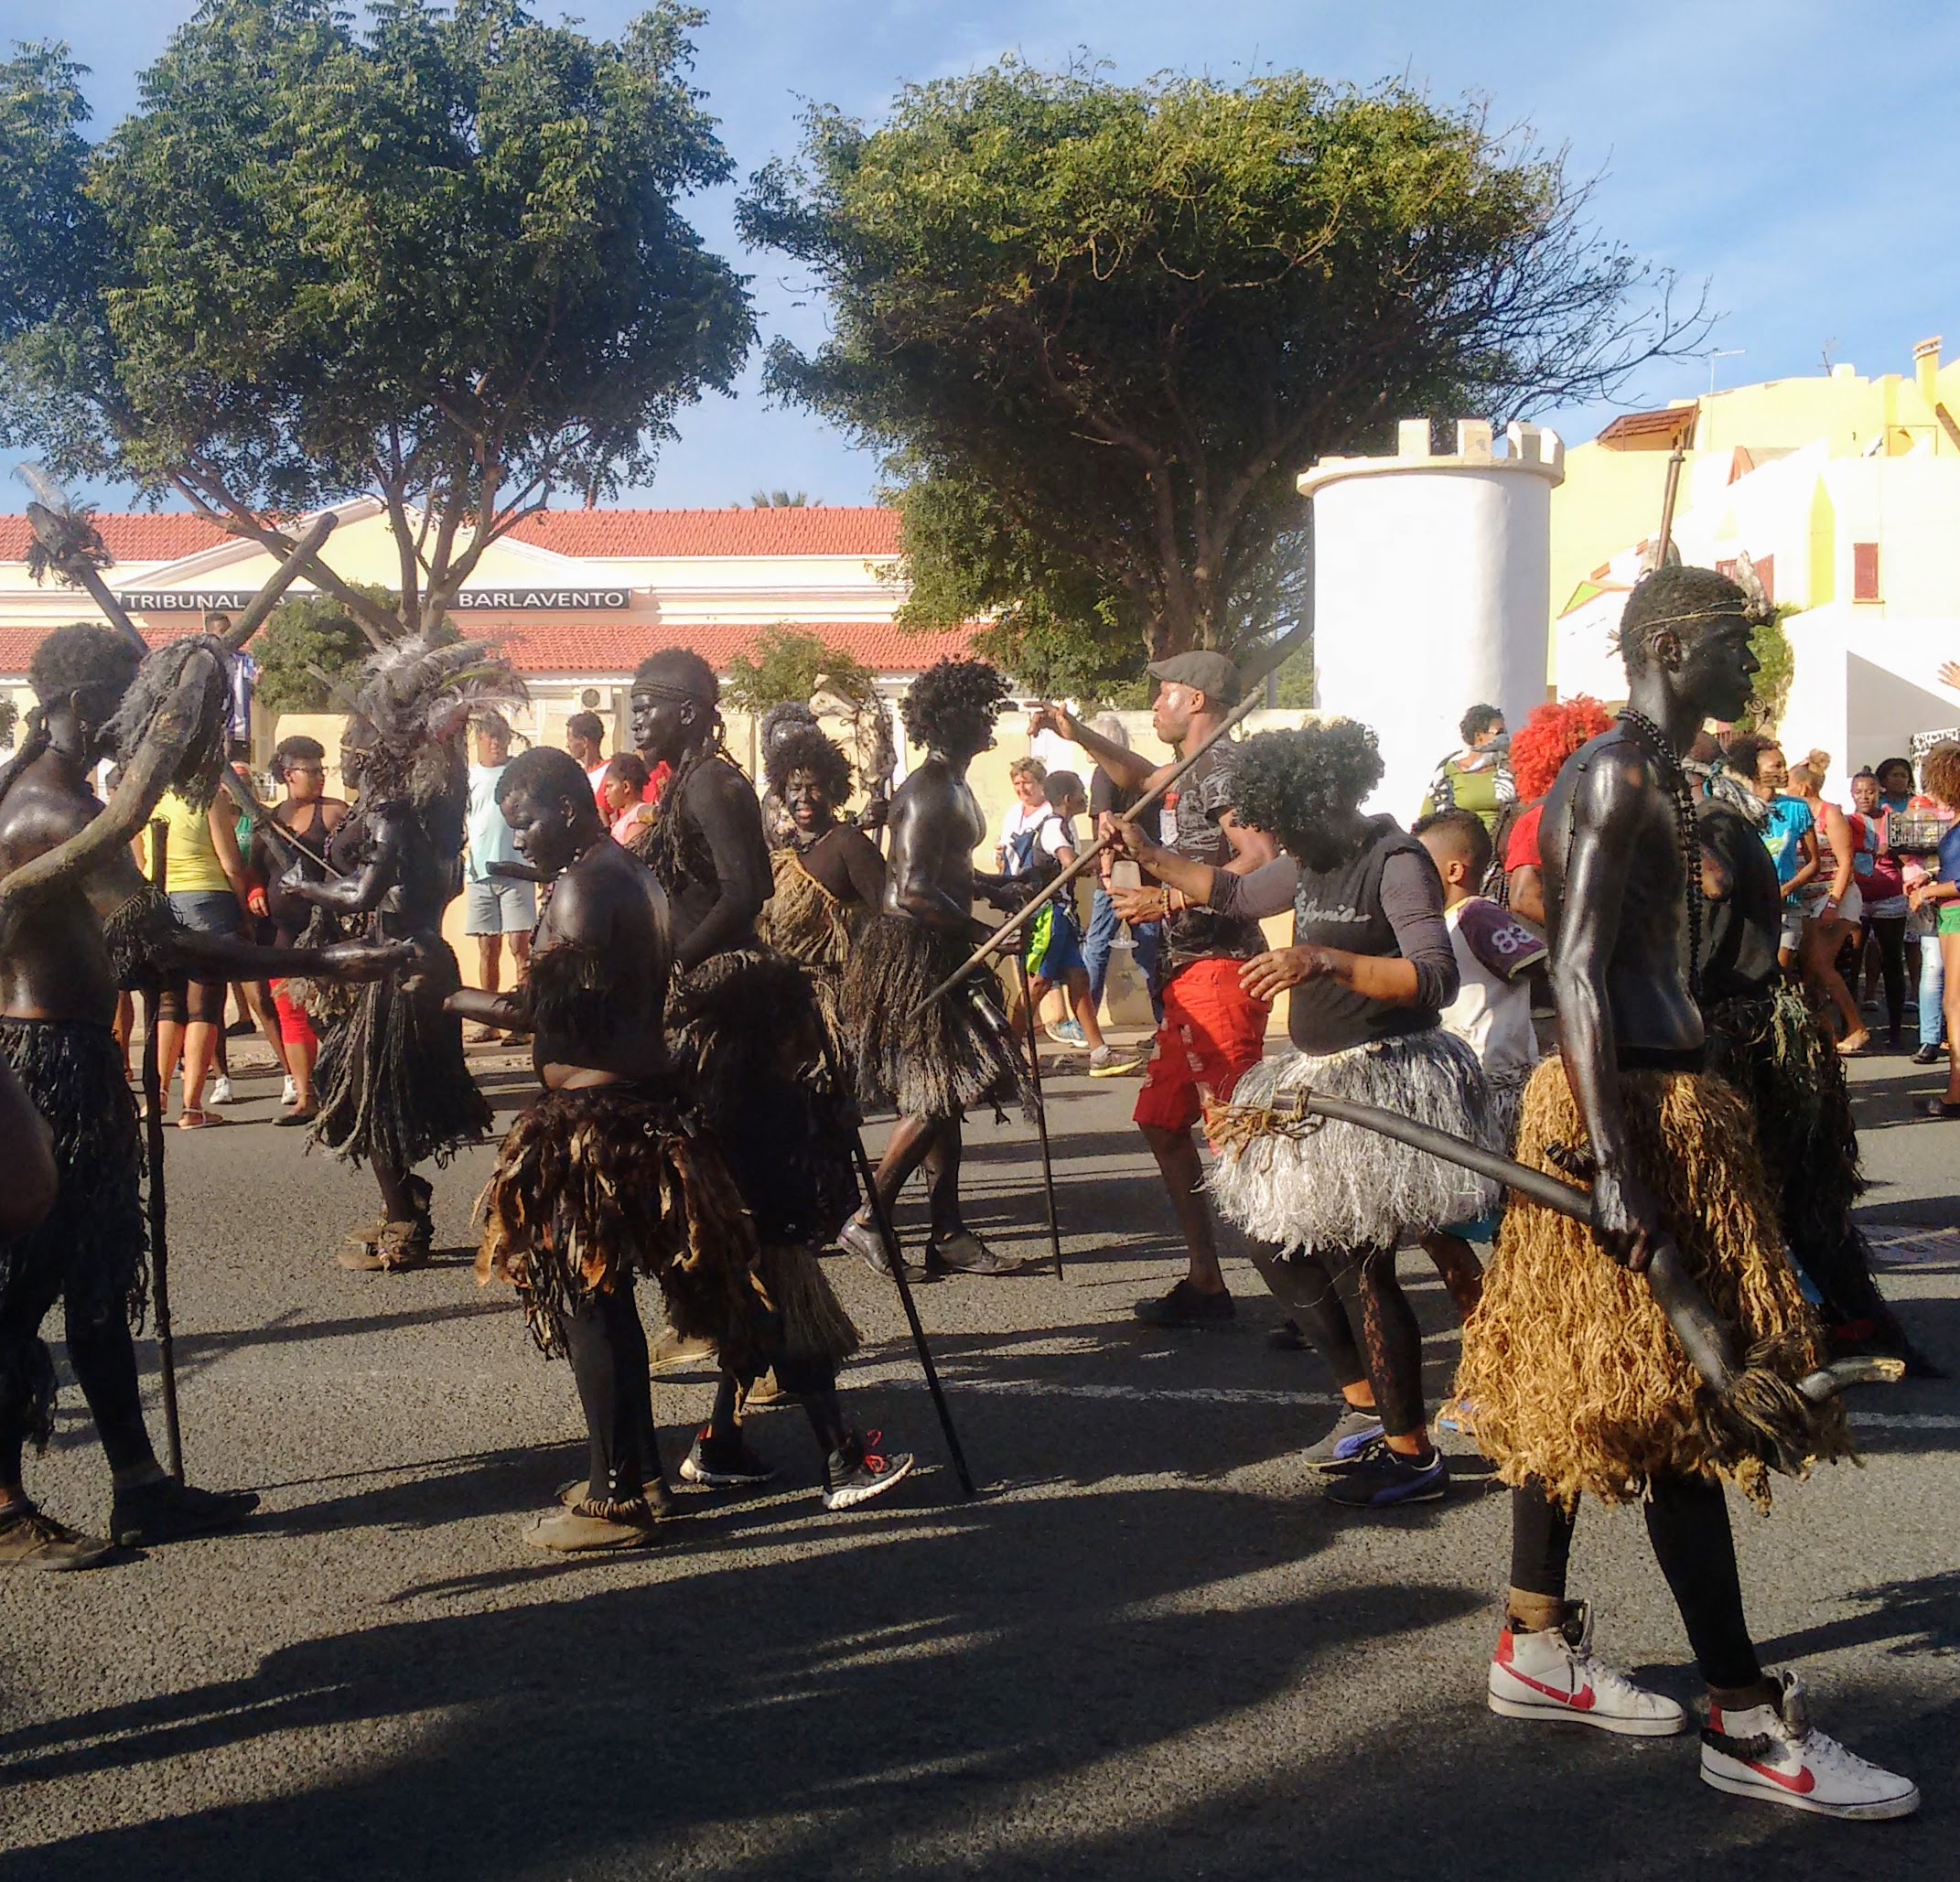 mindelo, sao vicente, cabo verde, cape verde, mandingo, carnaval, drumming